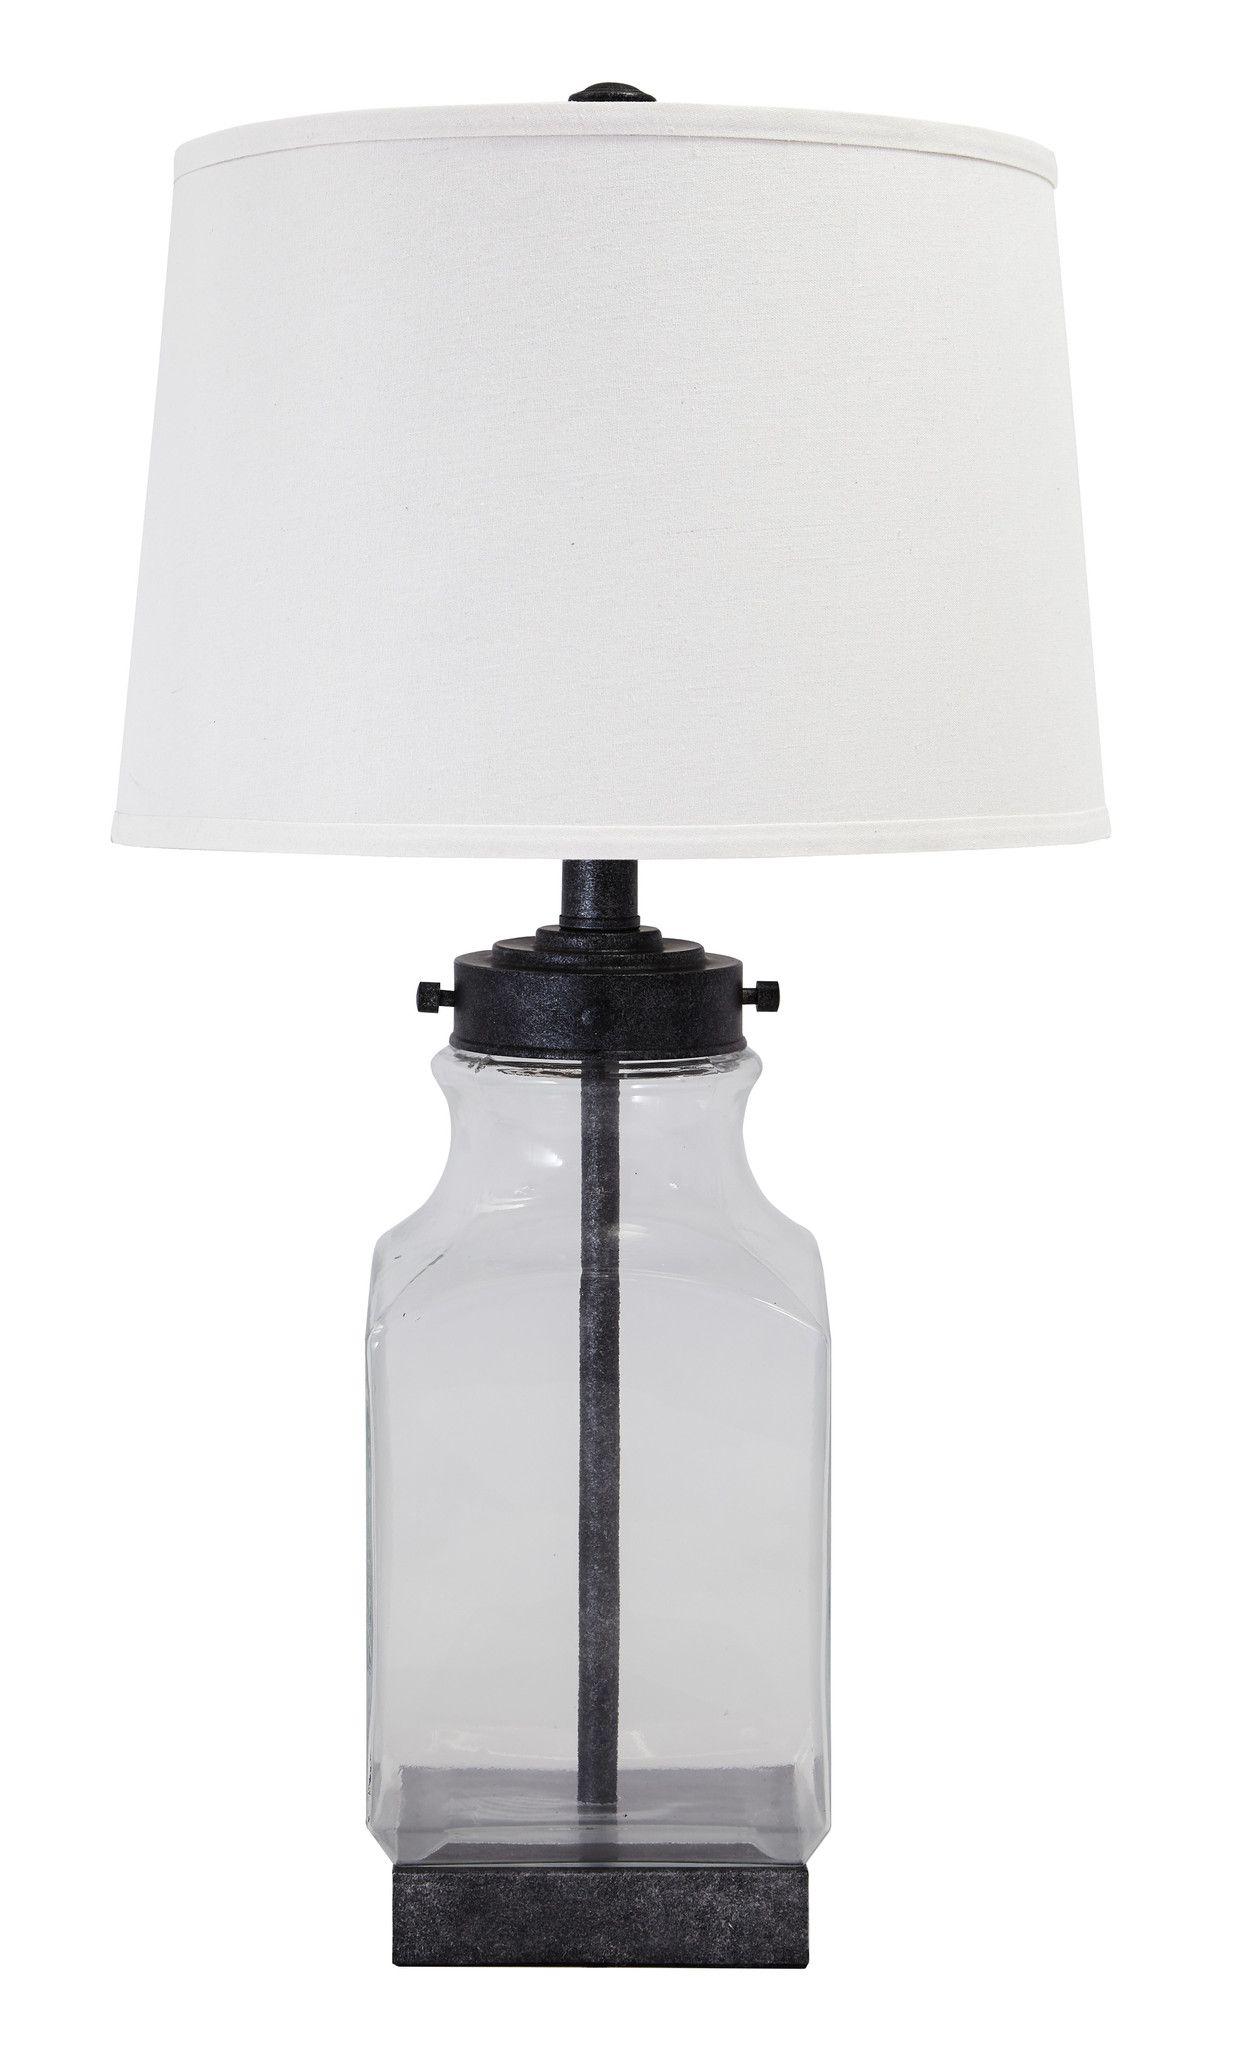 Glass Table Lamp Glass Table Lamp Lamp Table Lamp